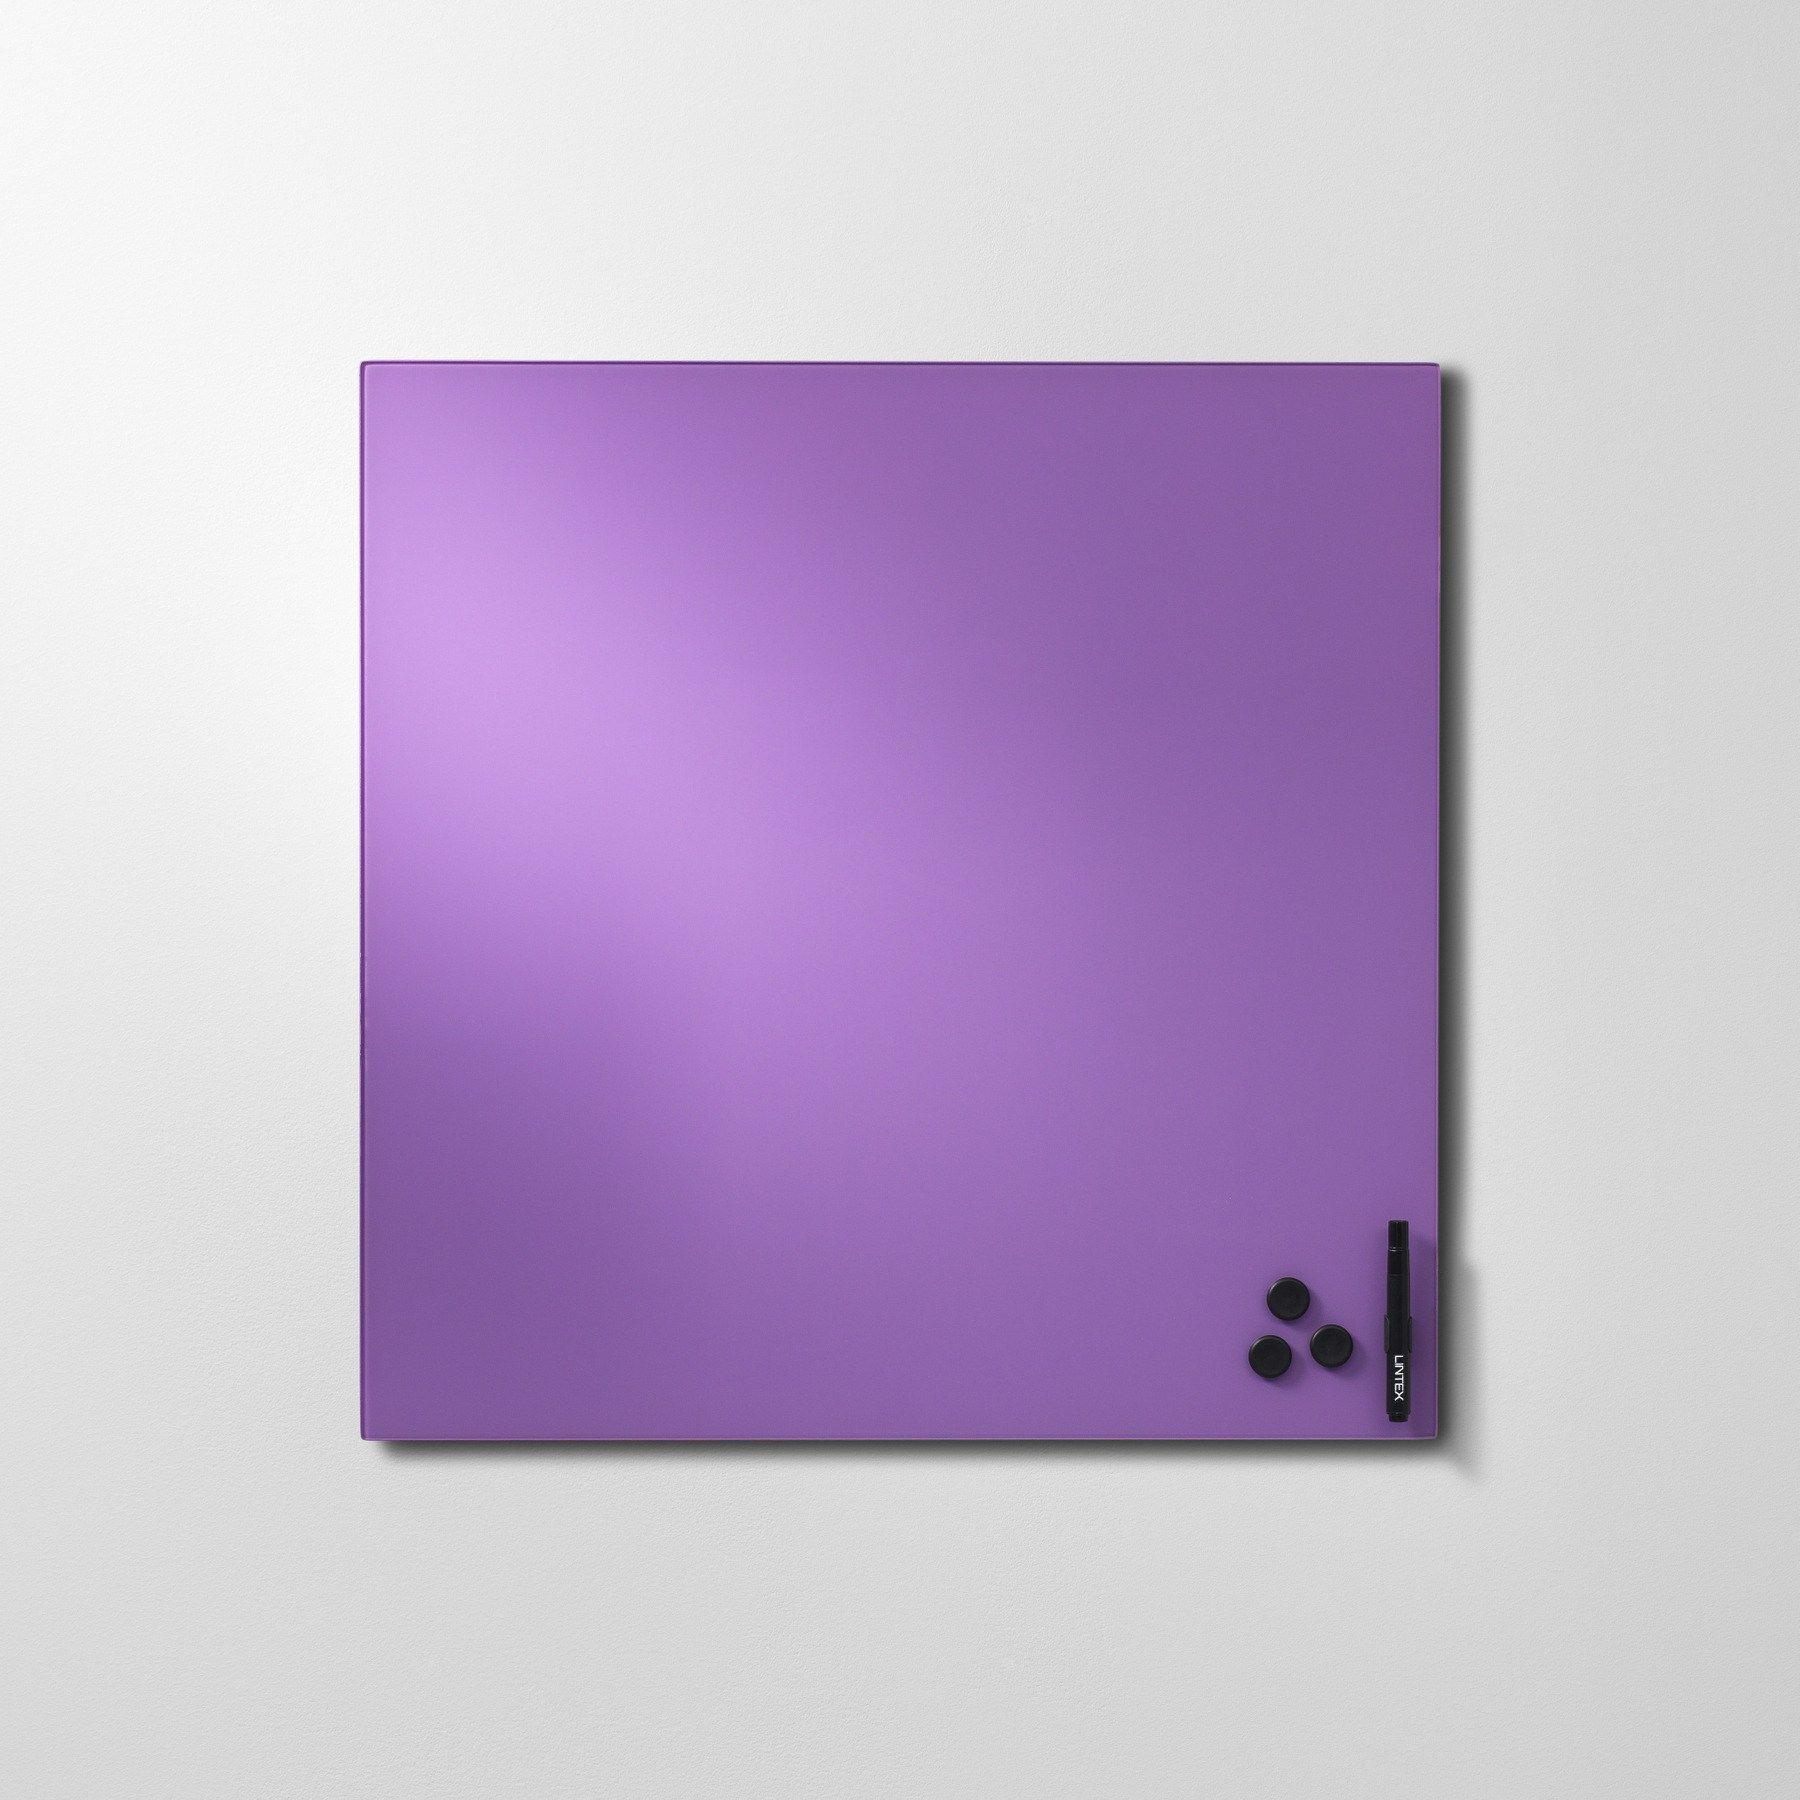 mood whiteboard zur wandmontage by lintex. Black Bedroom Furniture Sets. Home Design Ideas